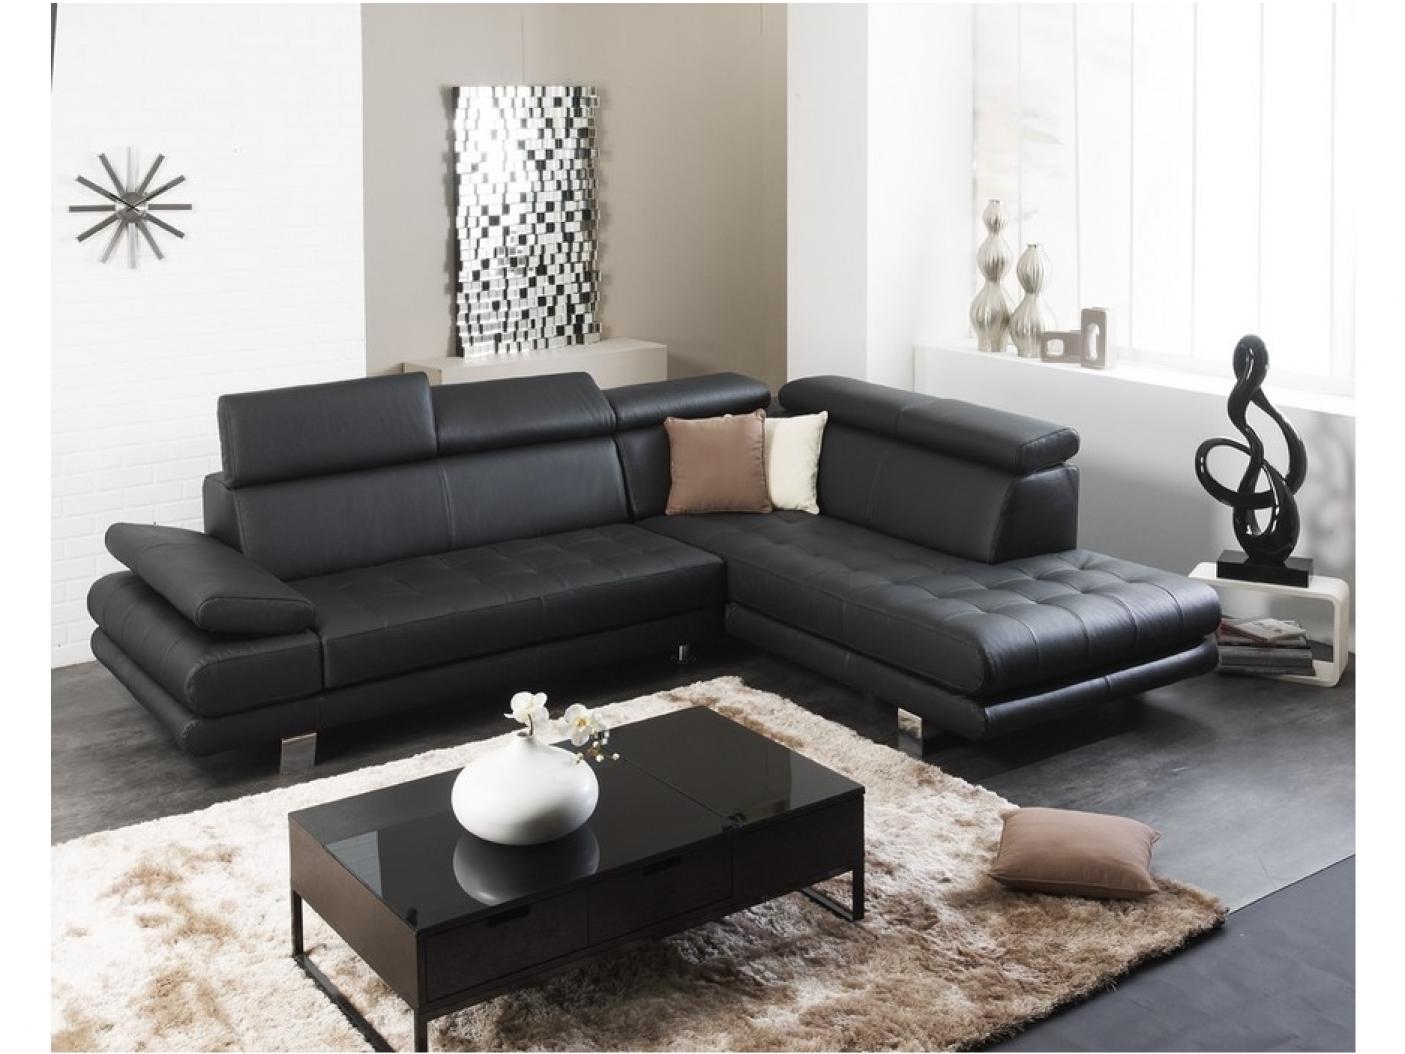 photos canap angle pas cher simili cuir. Black Bedroom Furniture Sets. Home Design Ideas